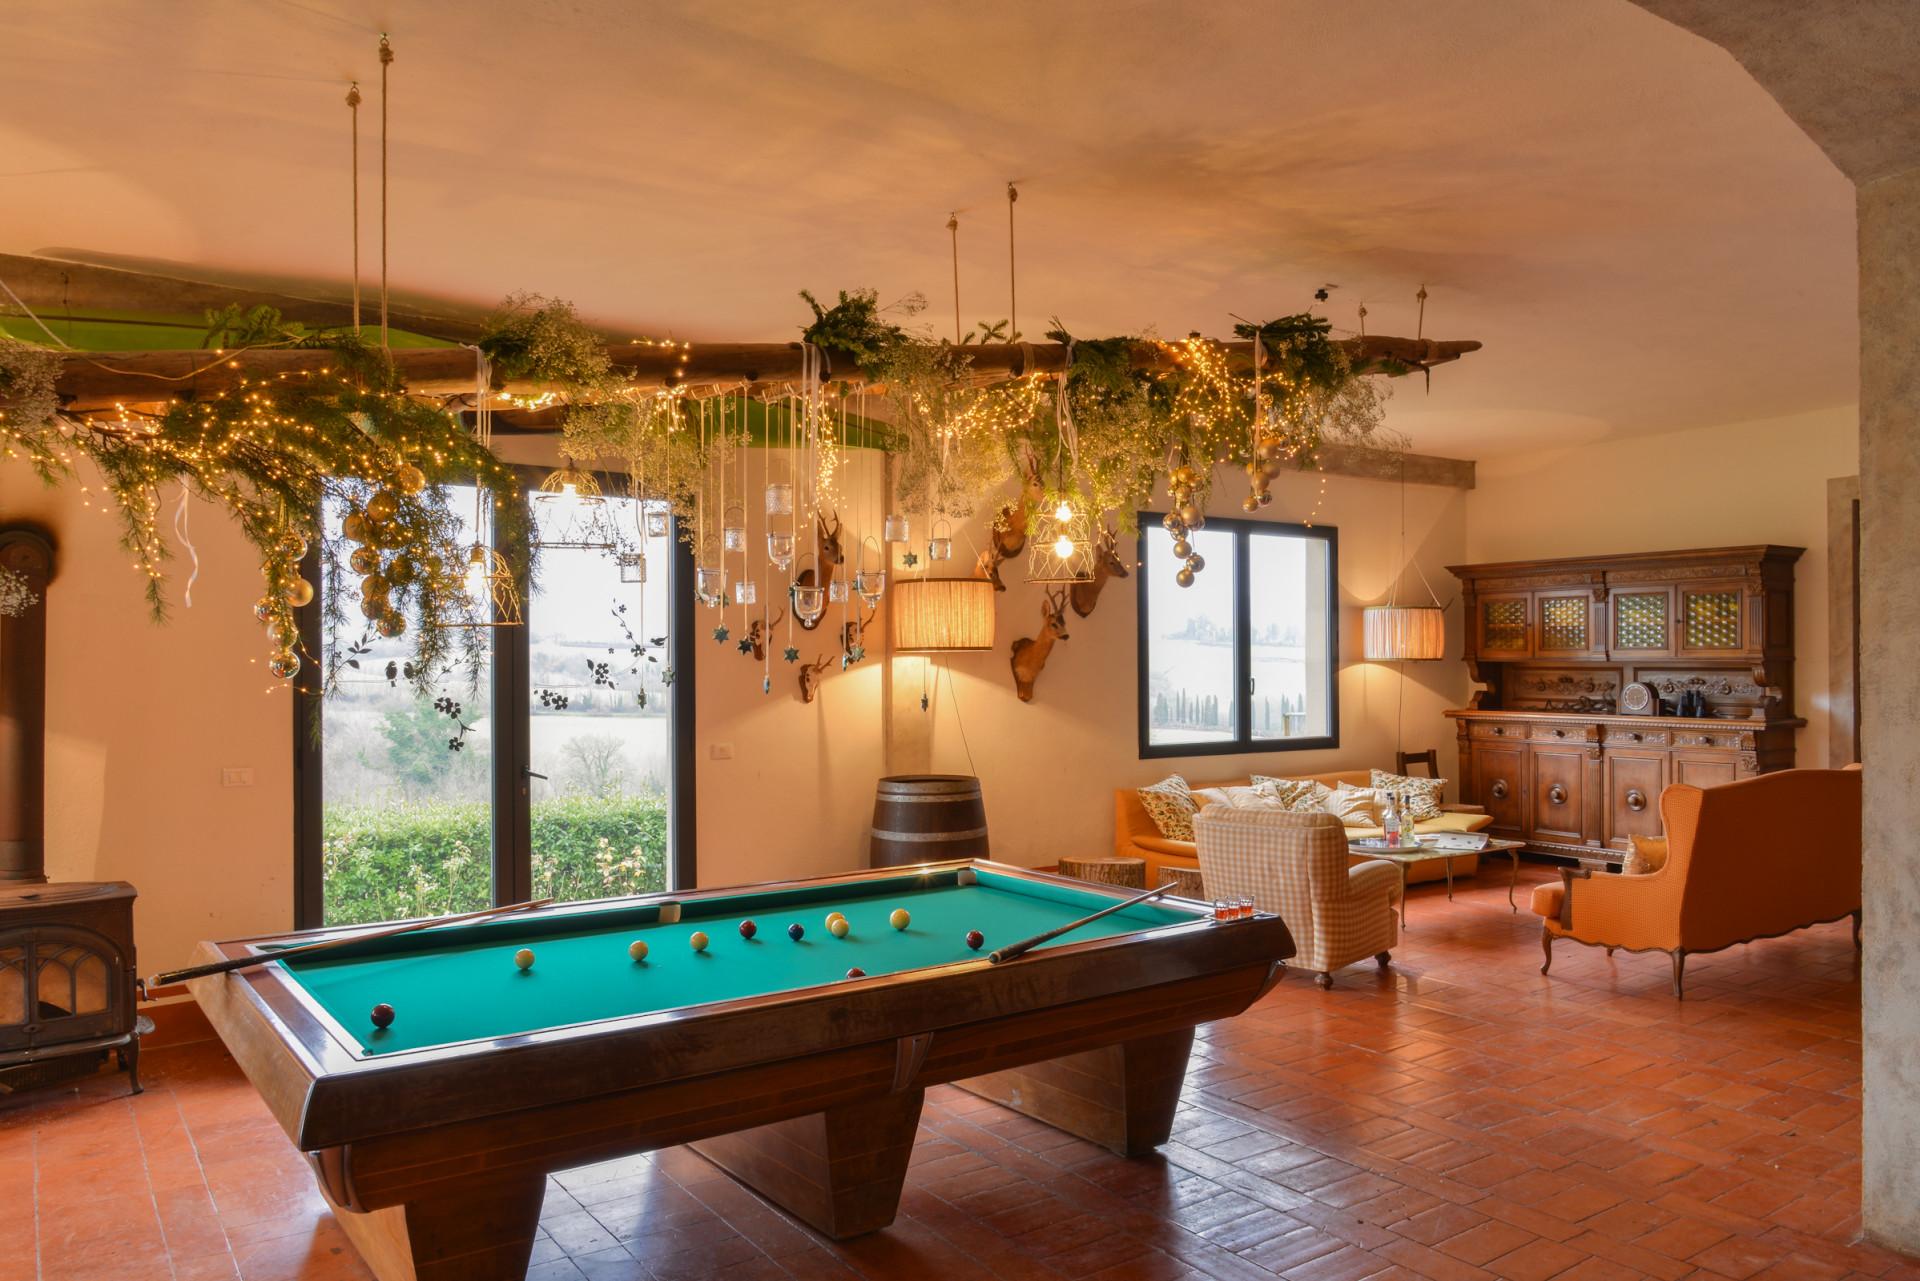 Tuscany Now&More Review, Tuscany Now & More Review, Tuscany Now & More, tuscany villa rental, villa rental in tuscany, homes to rent in tuscany